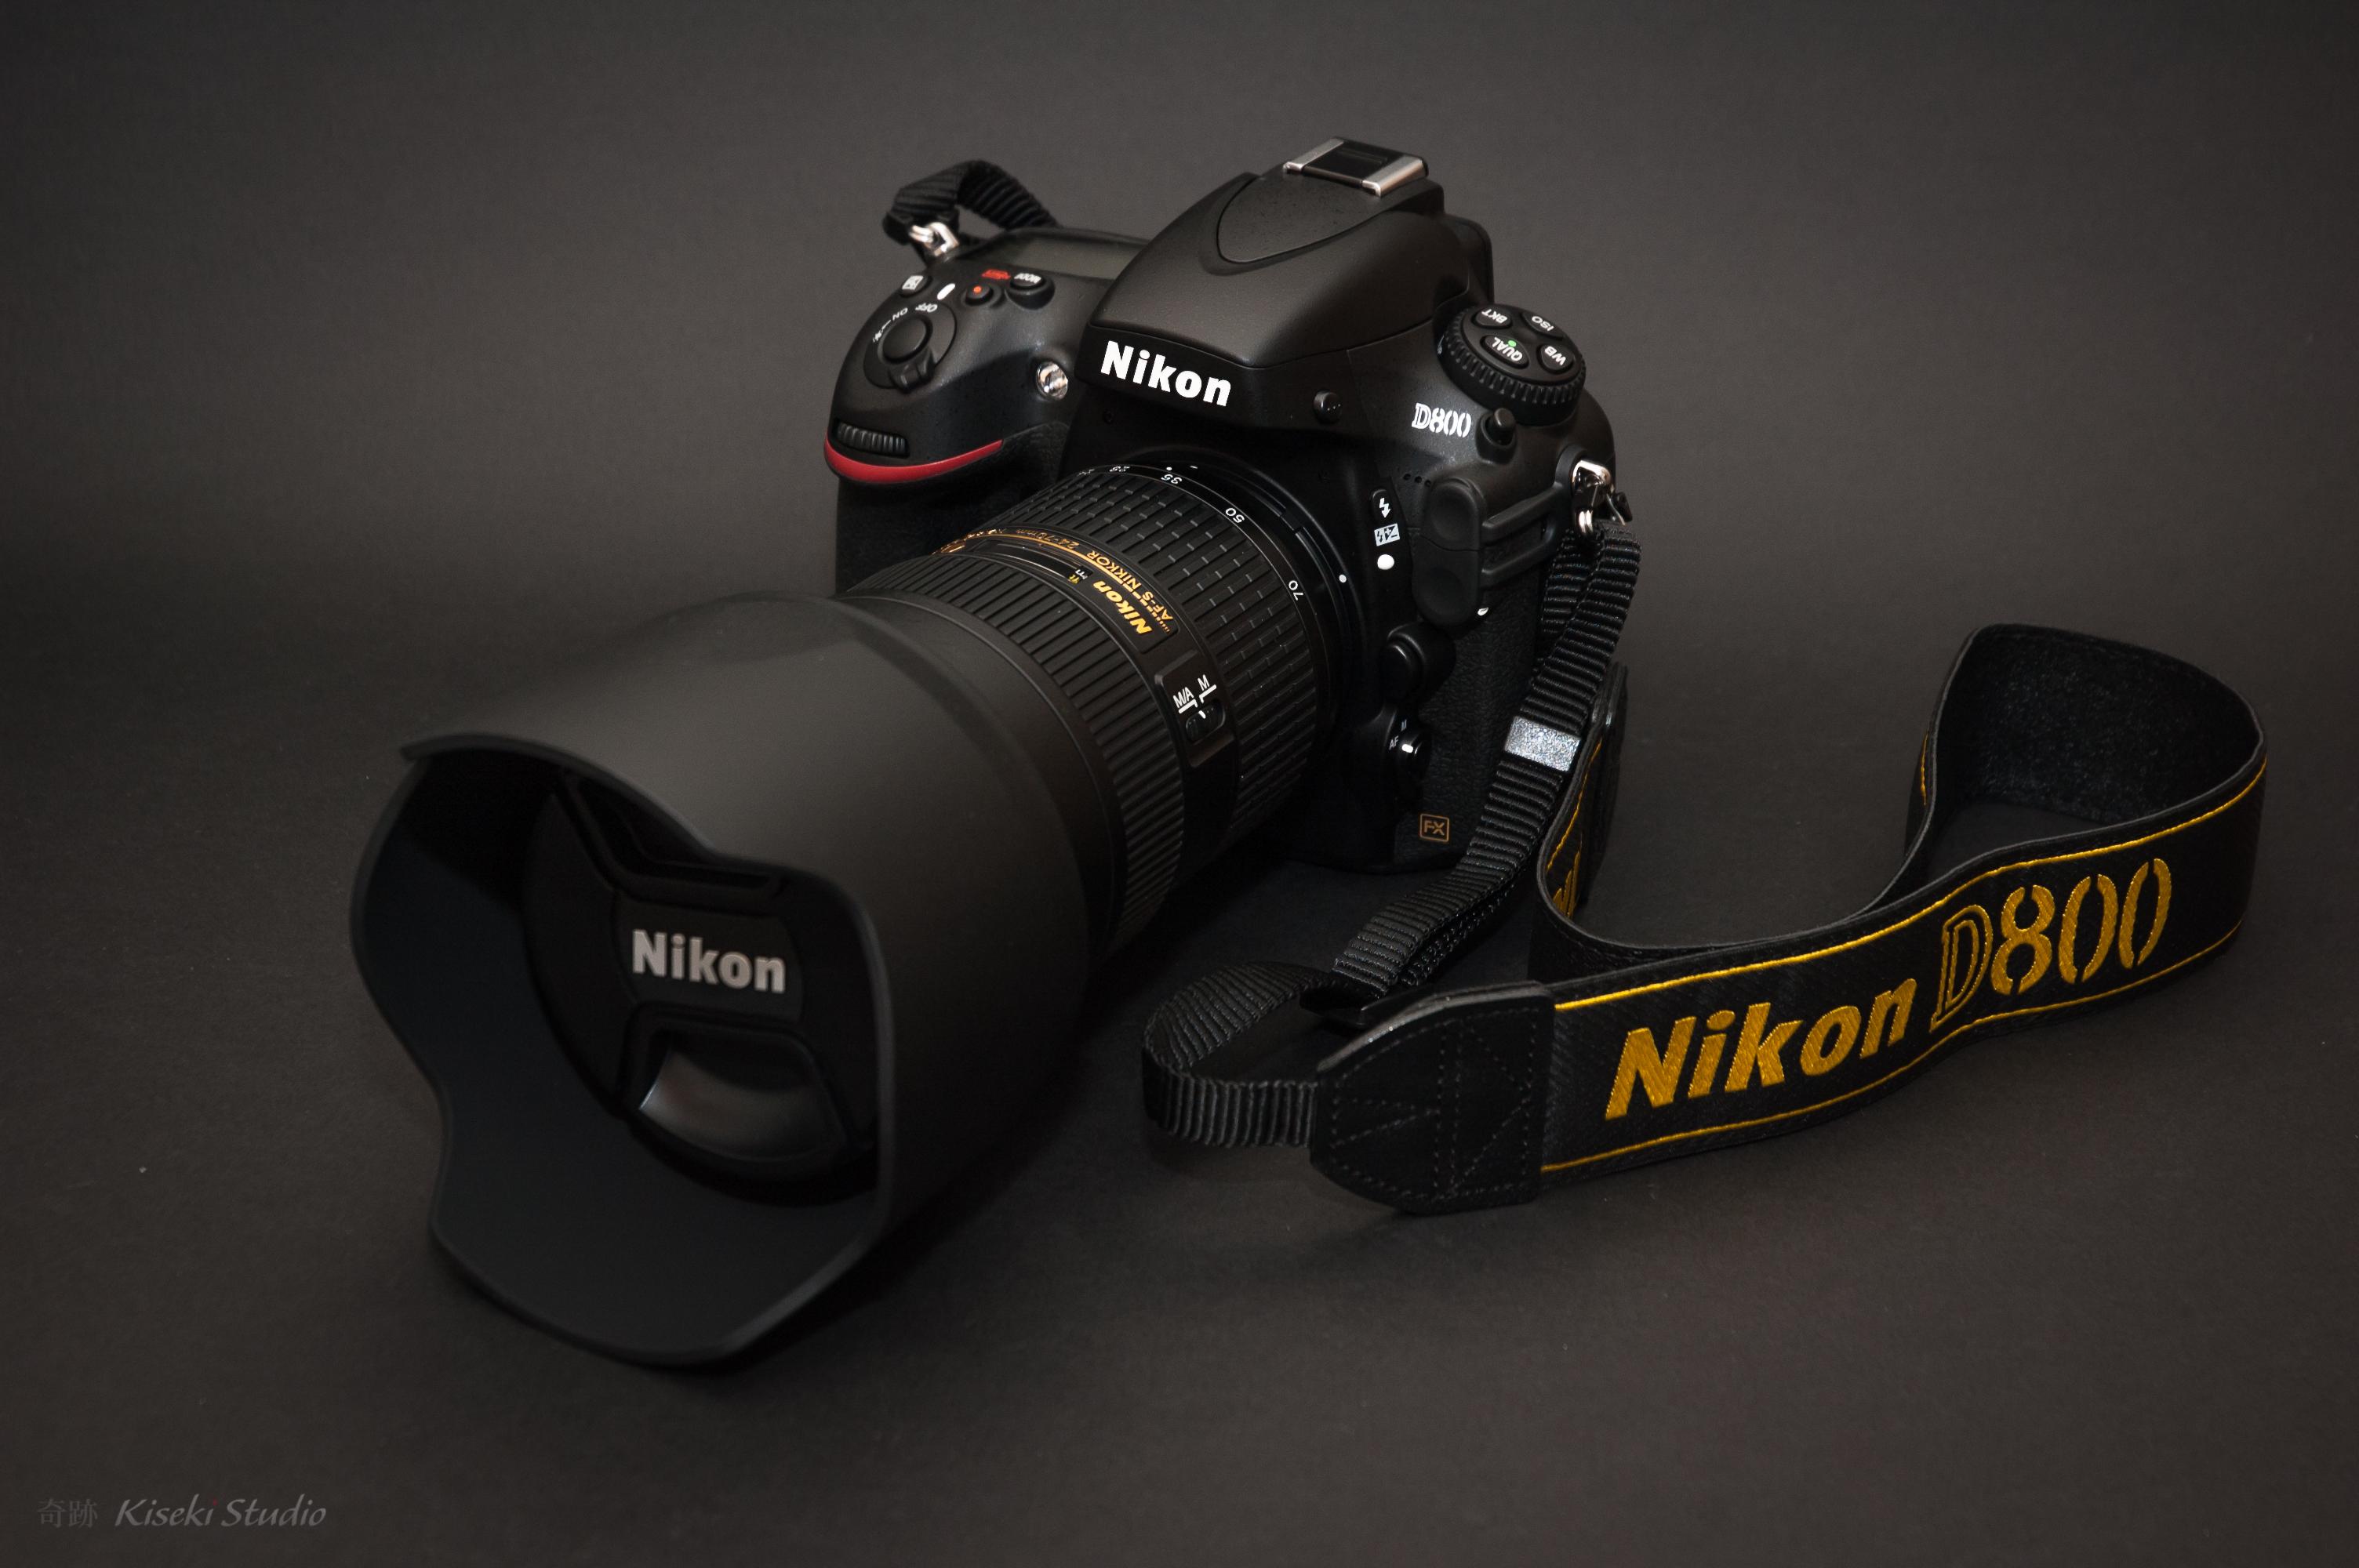 digital slr transcoding how to solve nikon d800 video and imovie rh digital slr transcoding blogspot com Nikon D800 Photography nikon d800 user manual